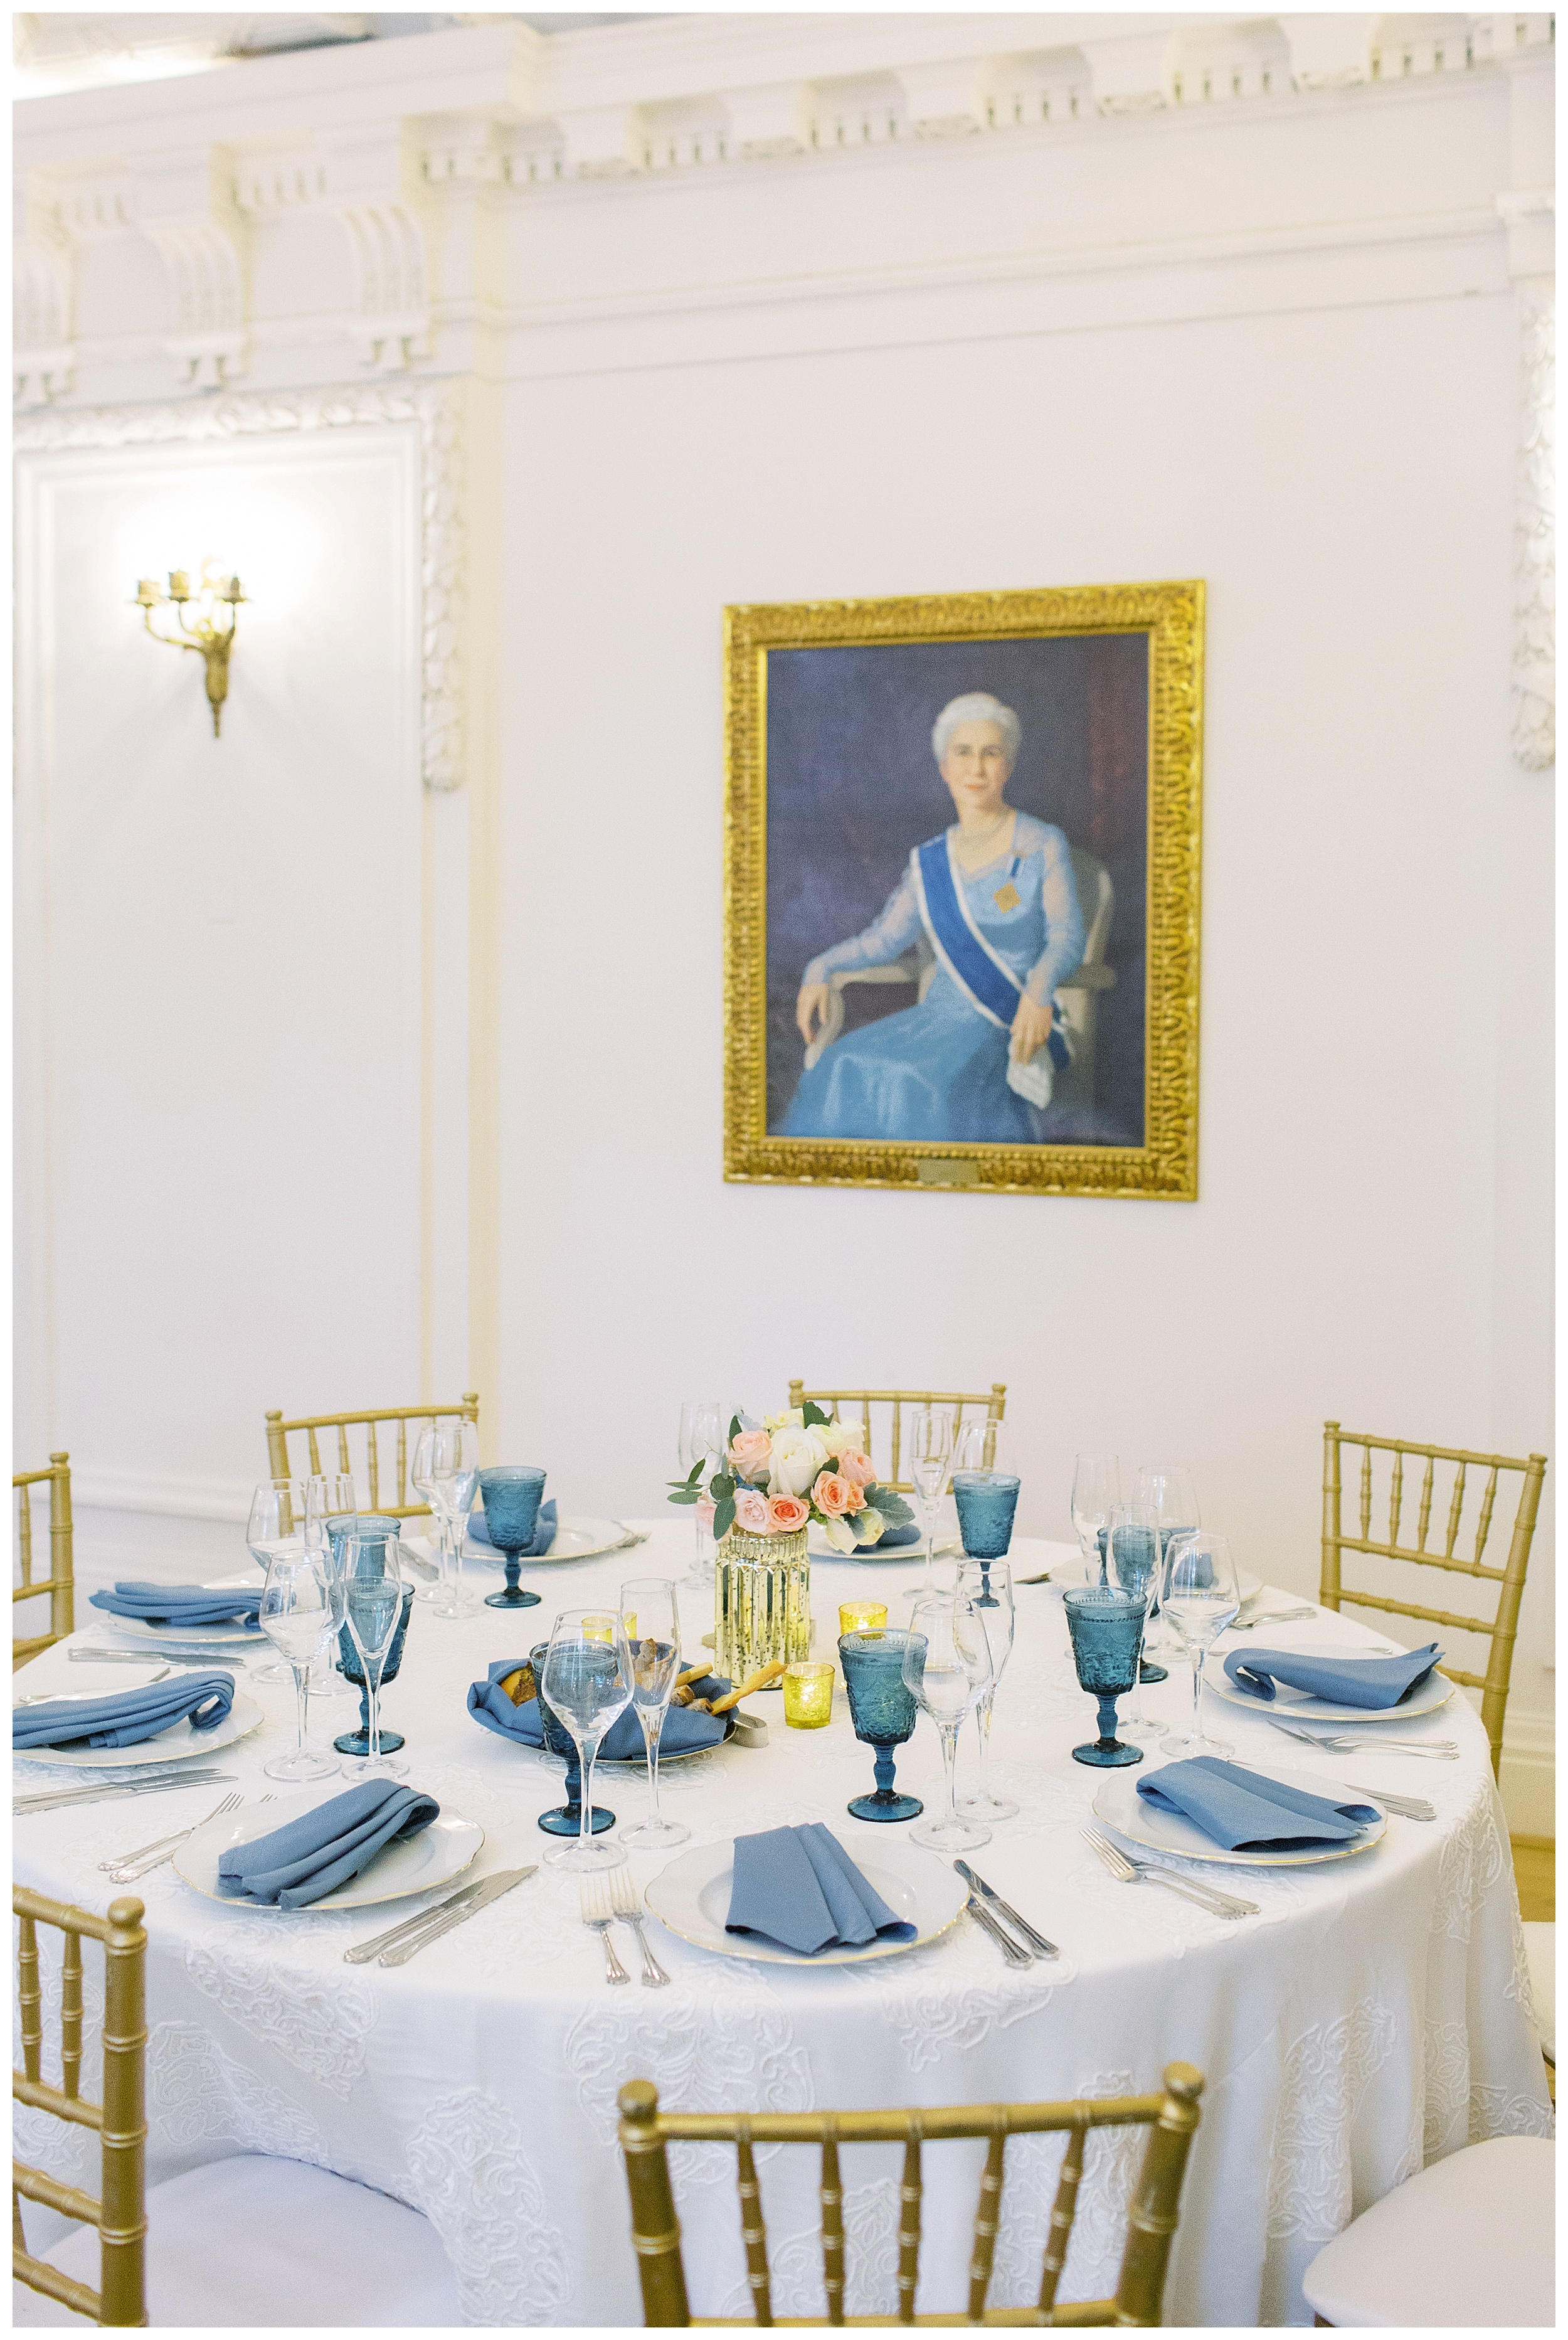 DAR Constitution Hall Wedding Wedding | Daughters of the American Revolution Wedding | District of Columbia Film Wedding Photographer Kir Tuben_0128.jpg